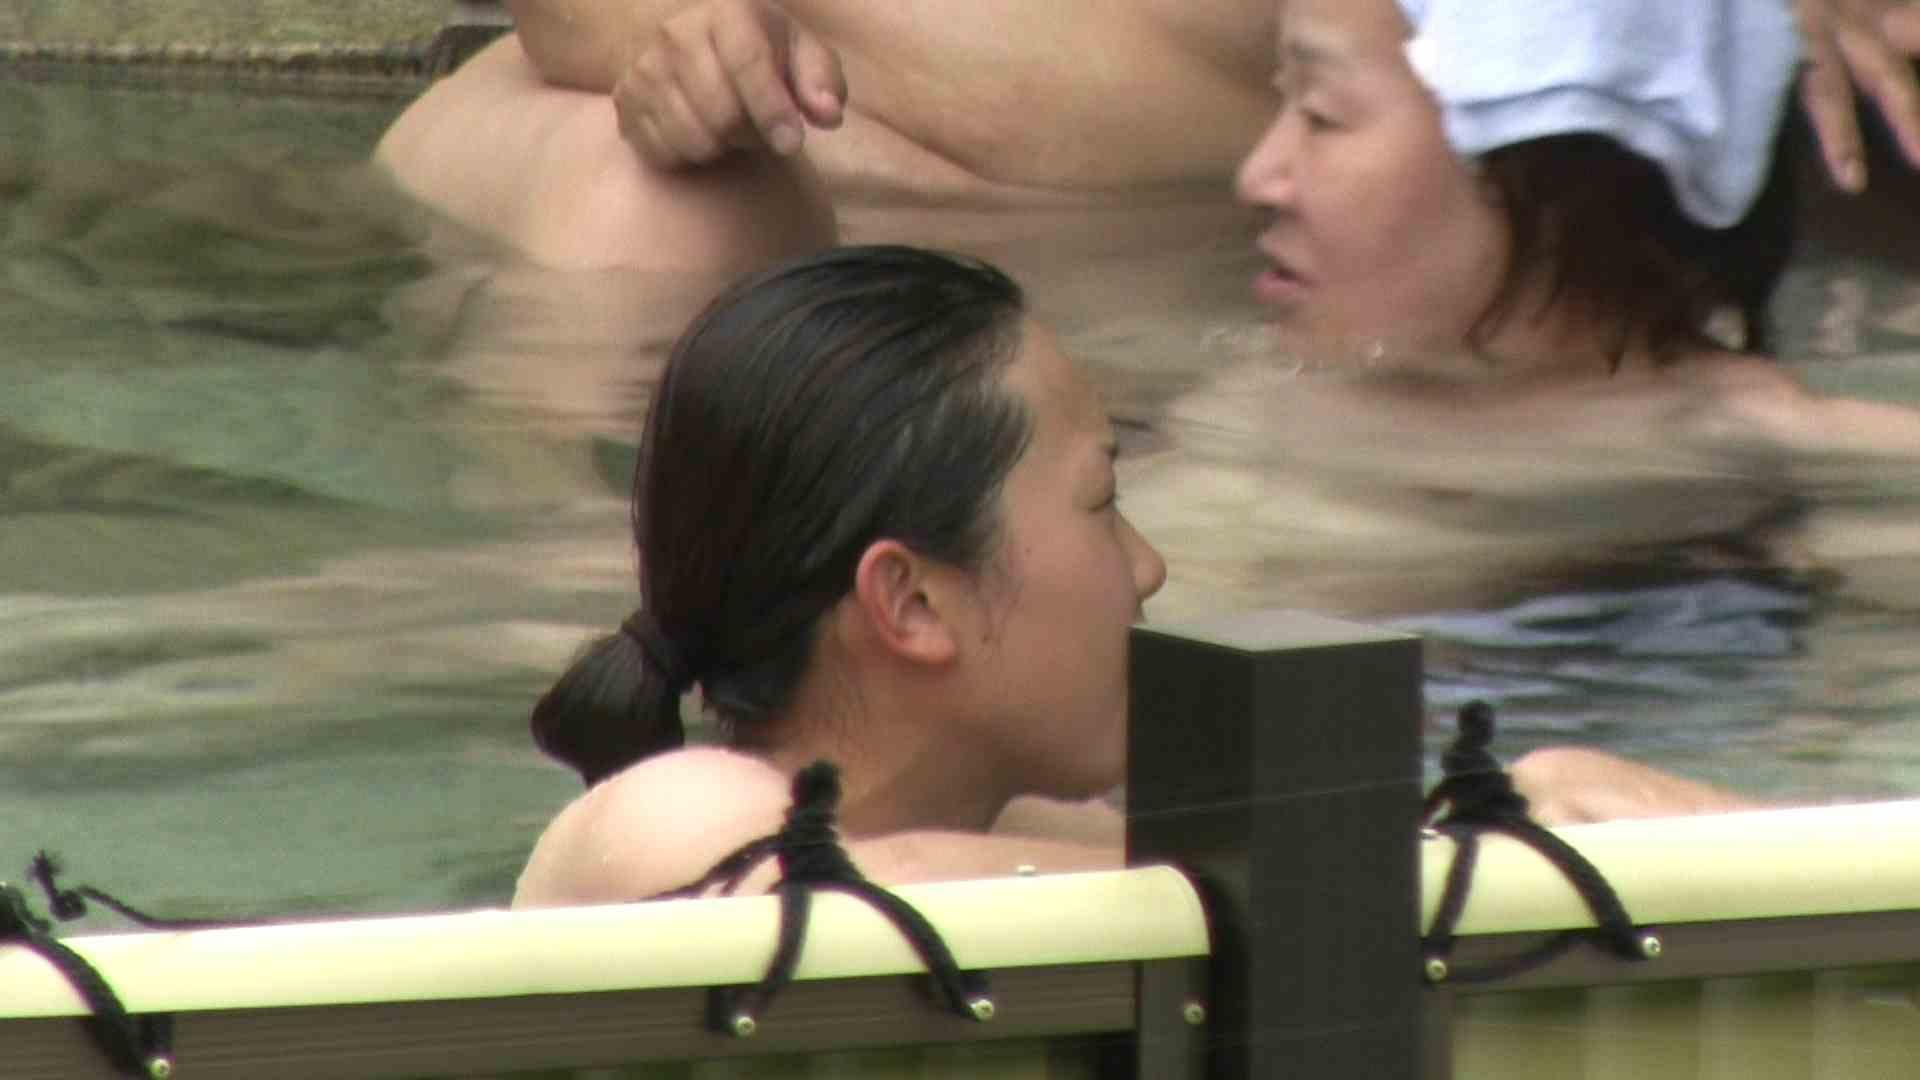 Aquaな露天風呂Vol.205 OLセックス 覗き性交動画流出 105画像 11